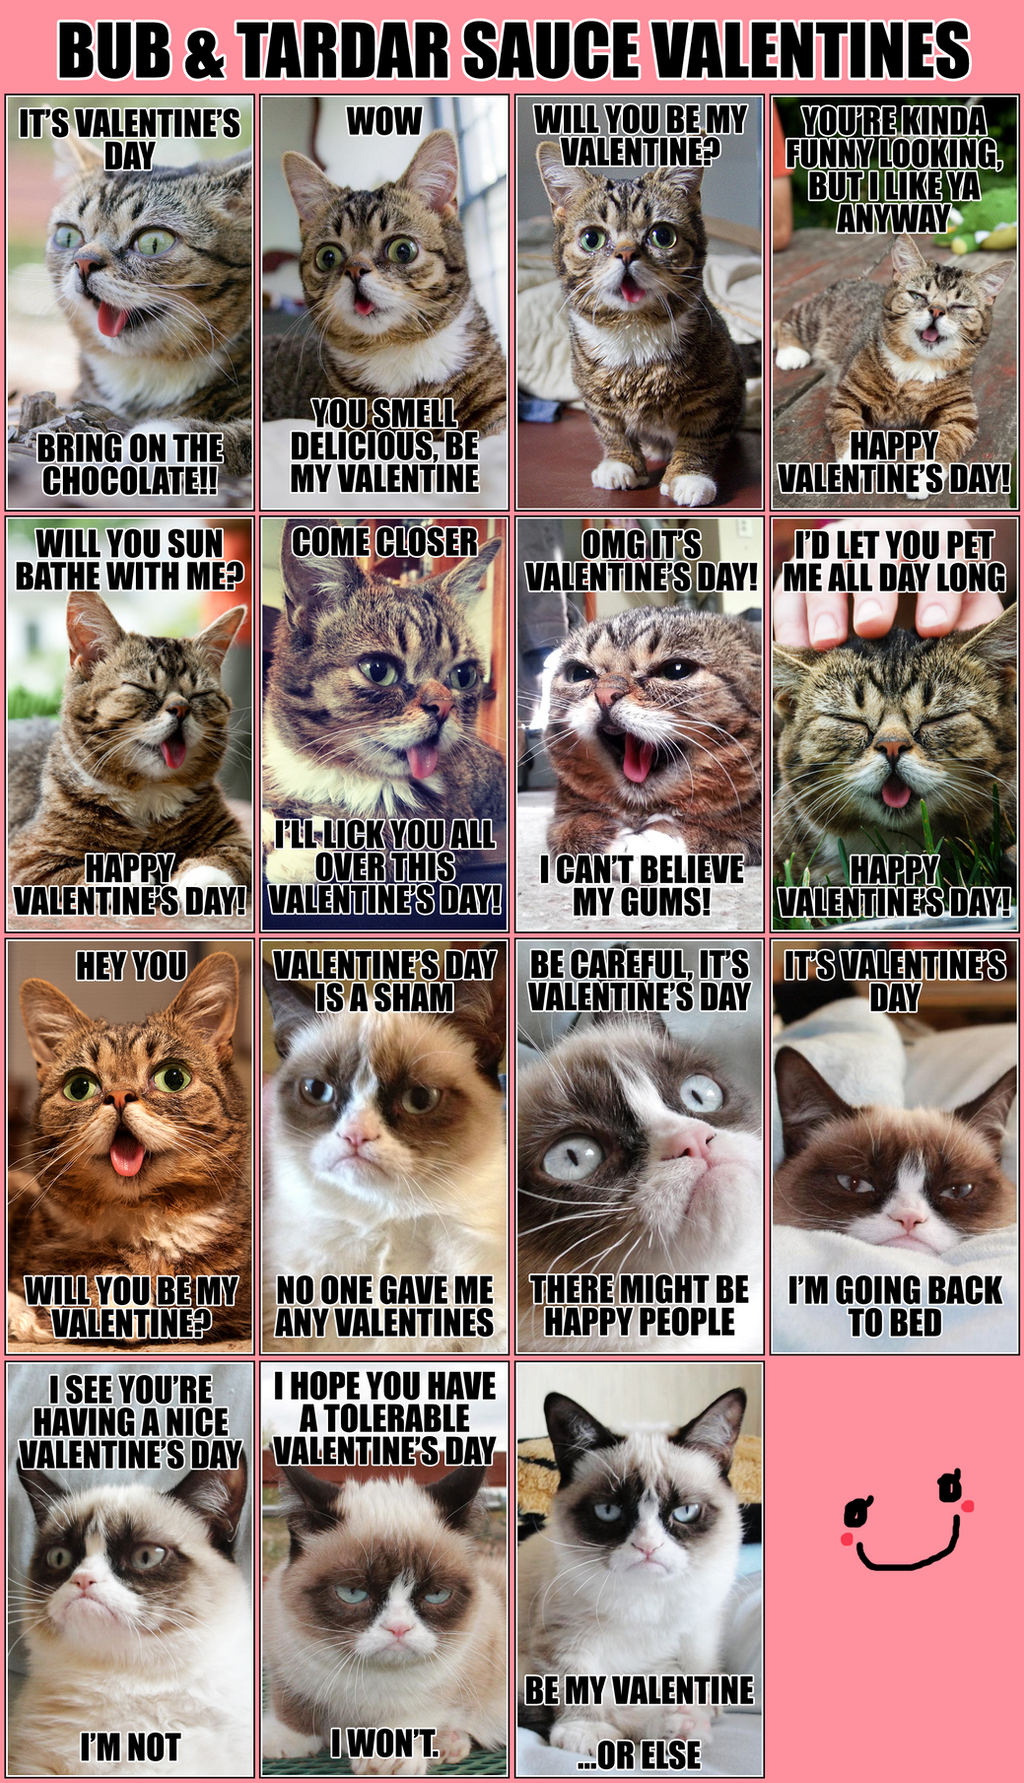 hellohappycrafts bub and tardar sauce grumpy cat valentines by hellohappycrafts